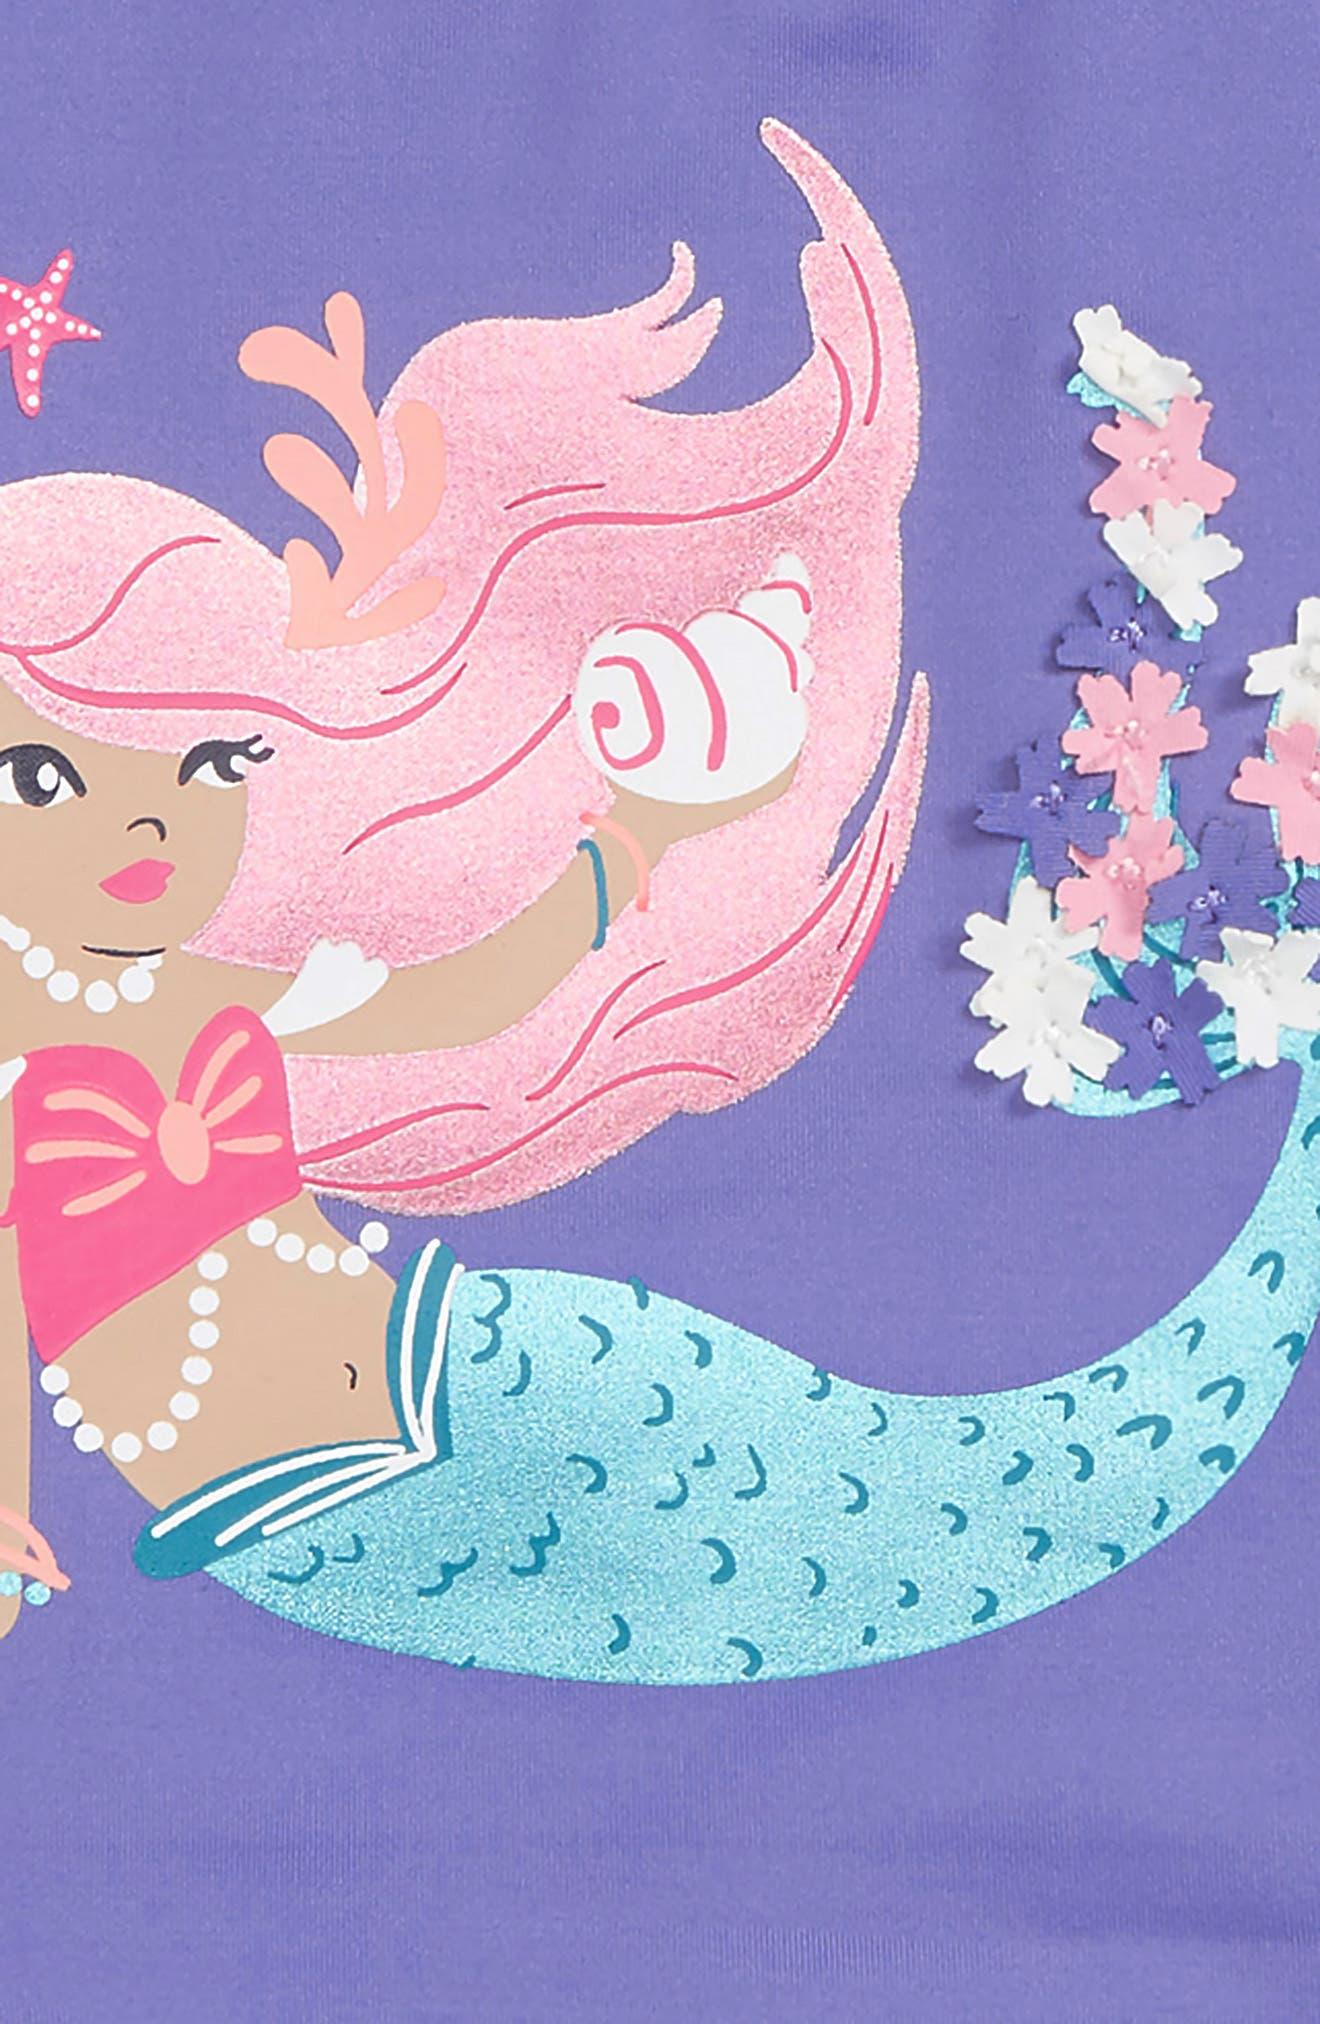 HATLEY, Mermaid Tales Two-Piece Rashguard Swimsuit, Alternate thumbnail 2, color, PURPLE